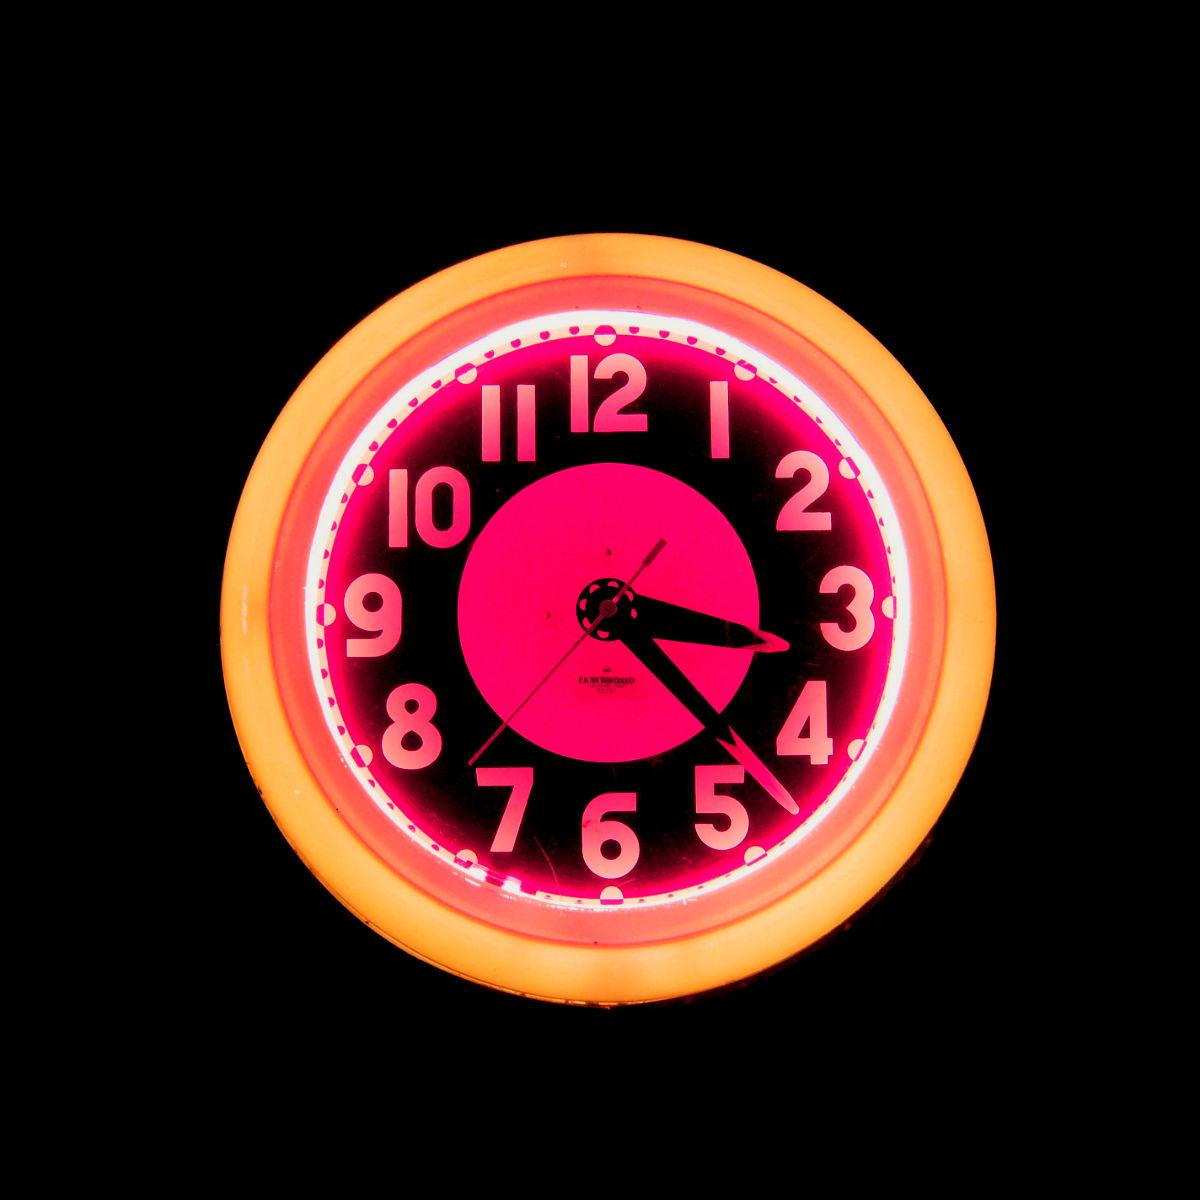 resized Neon Clock.jpg